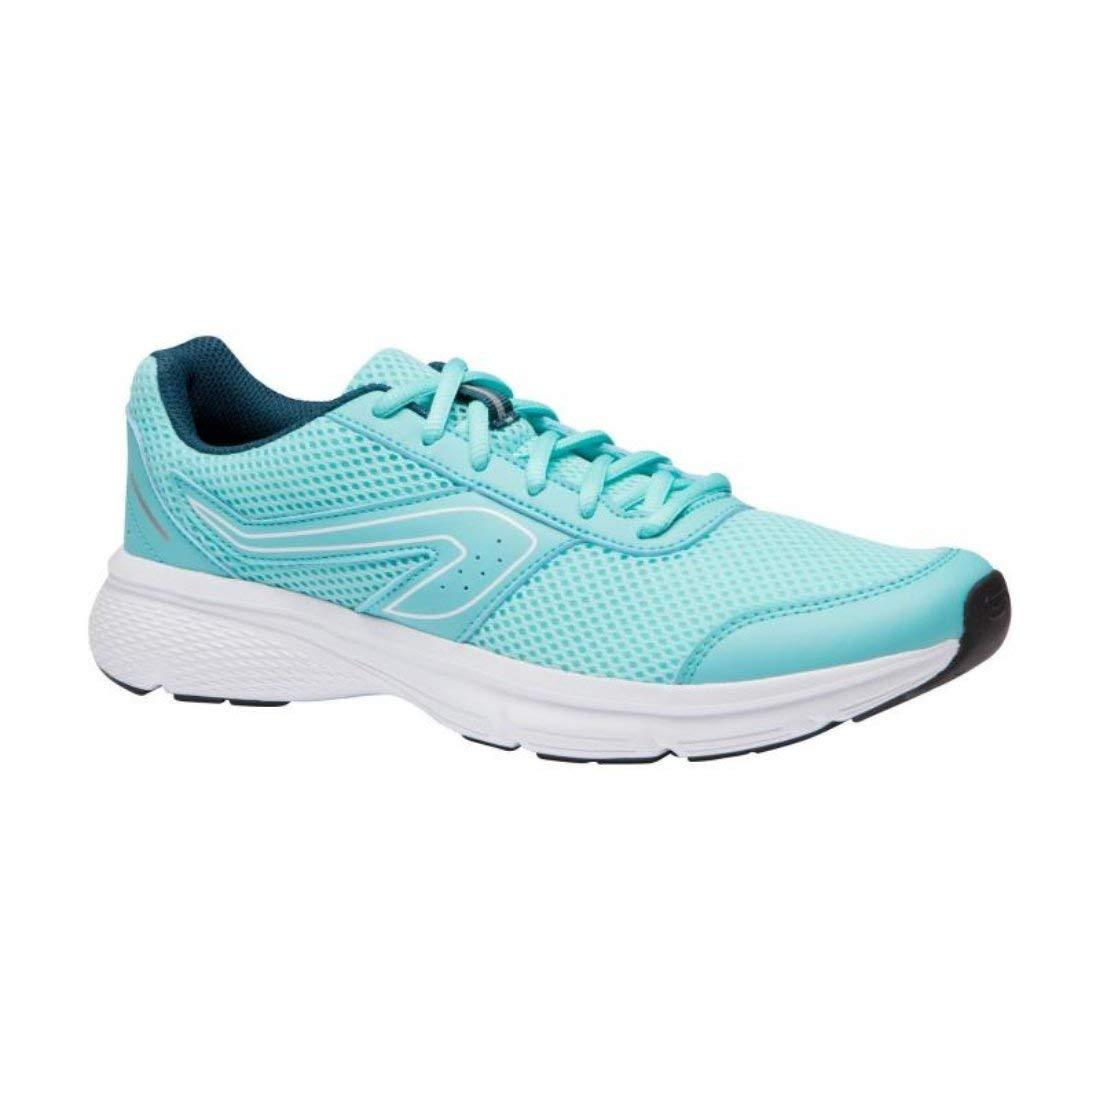 kalenji all shoes official db45b e5c98